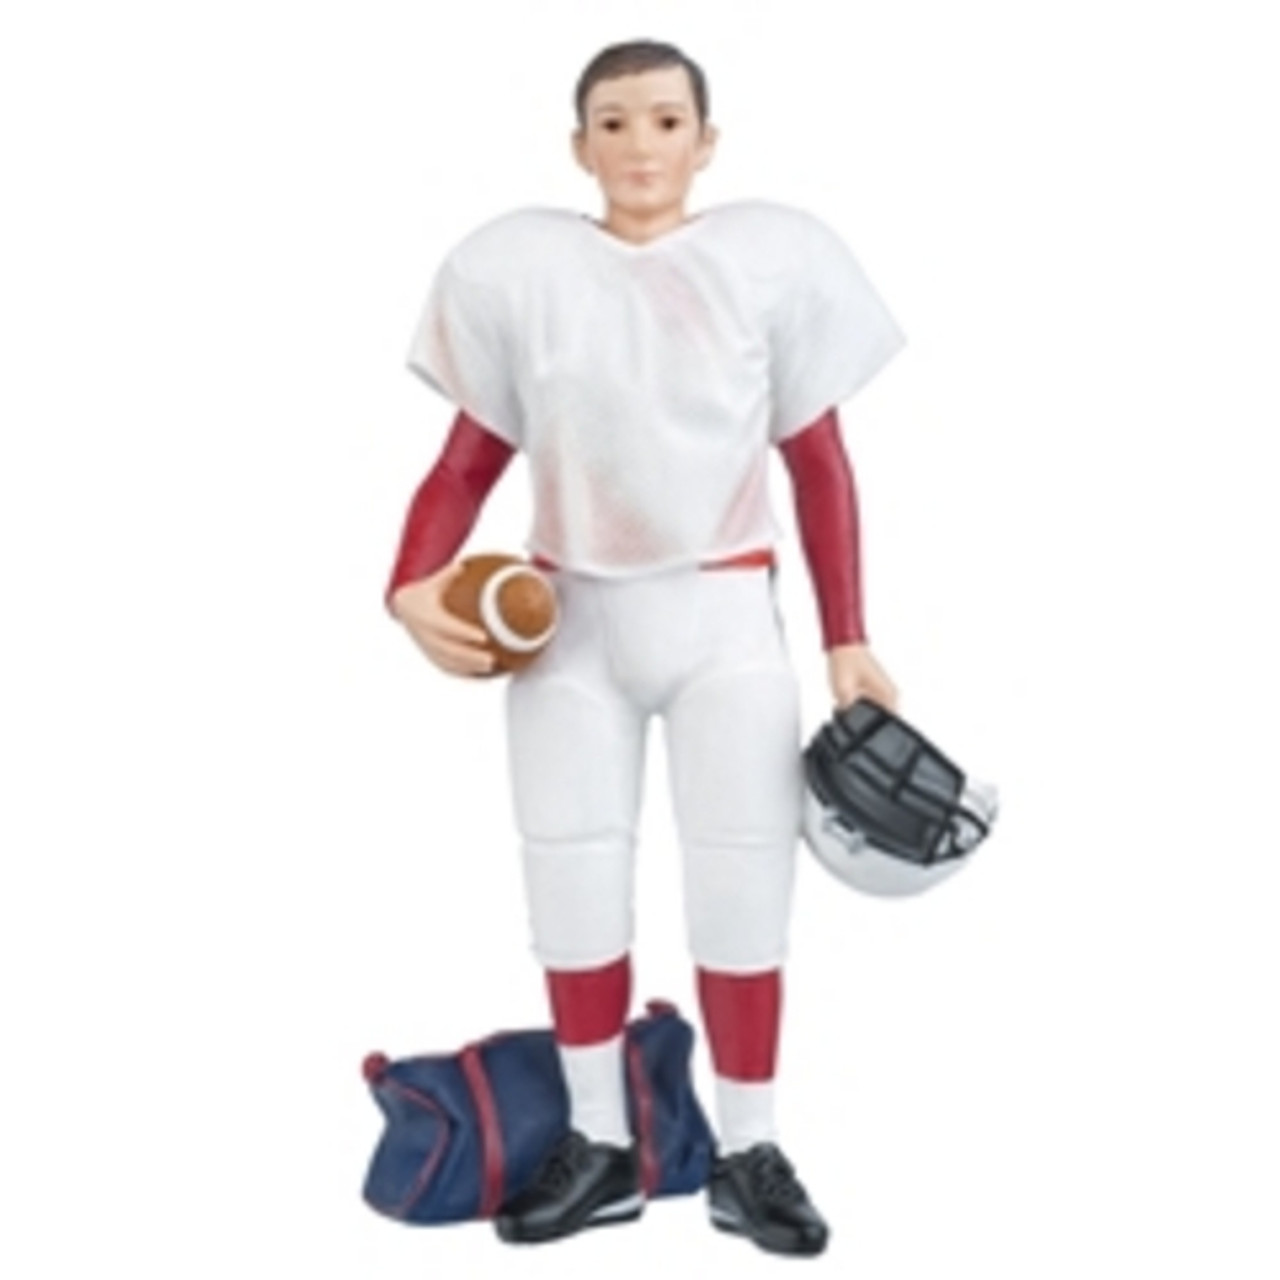 Kyle - Football Player